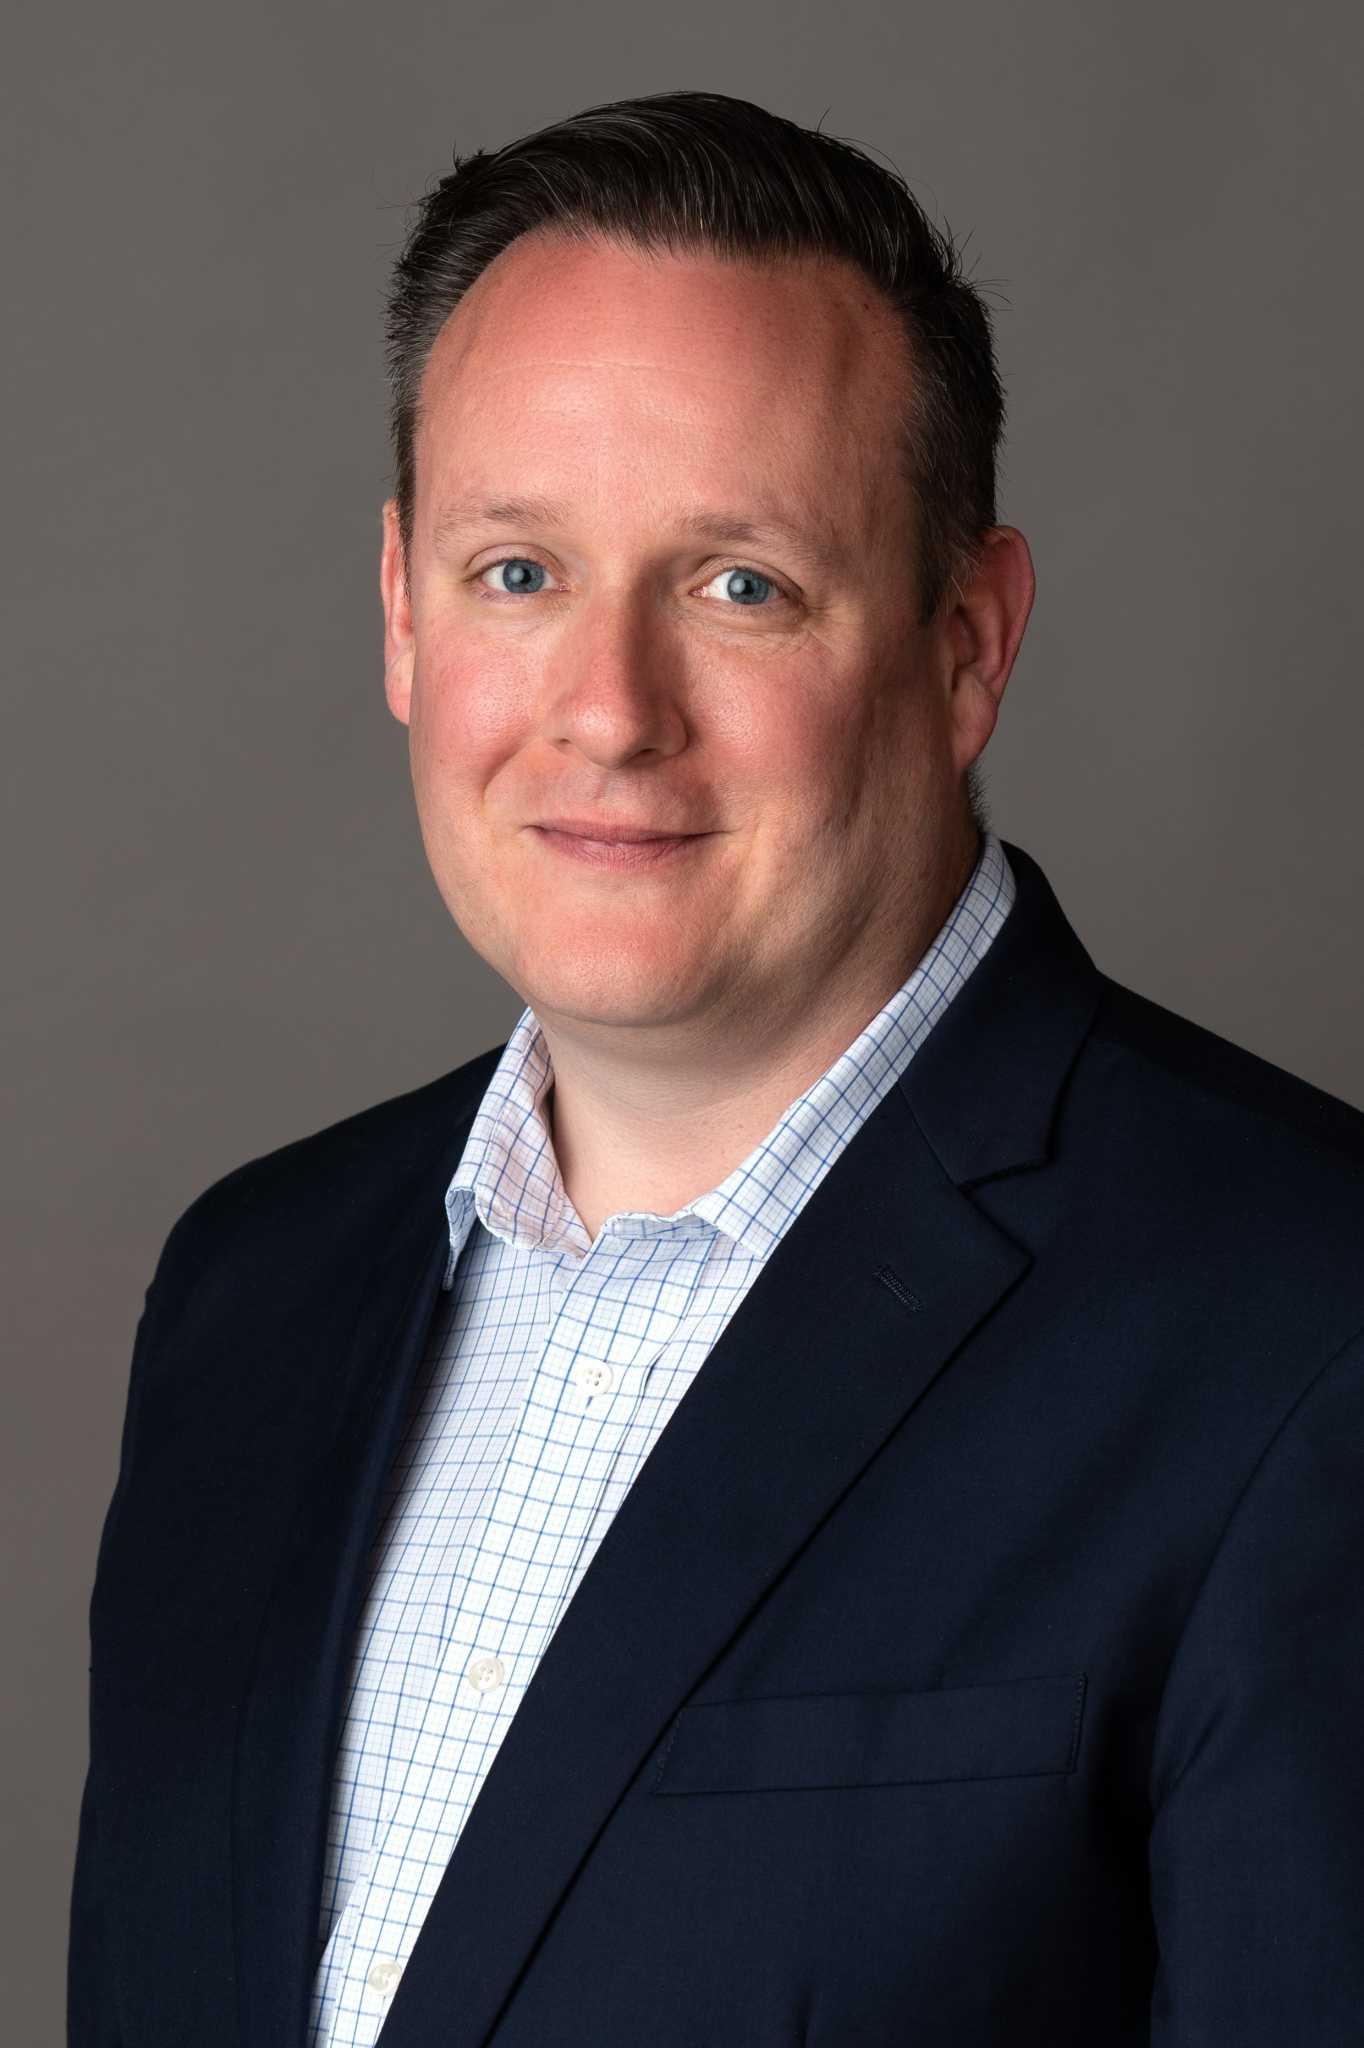 ourmidland.com - Tom Webb installed as president of Midland Board of Realtors